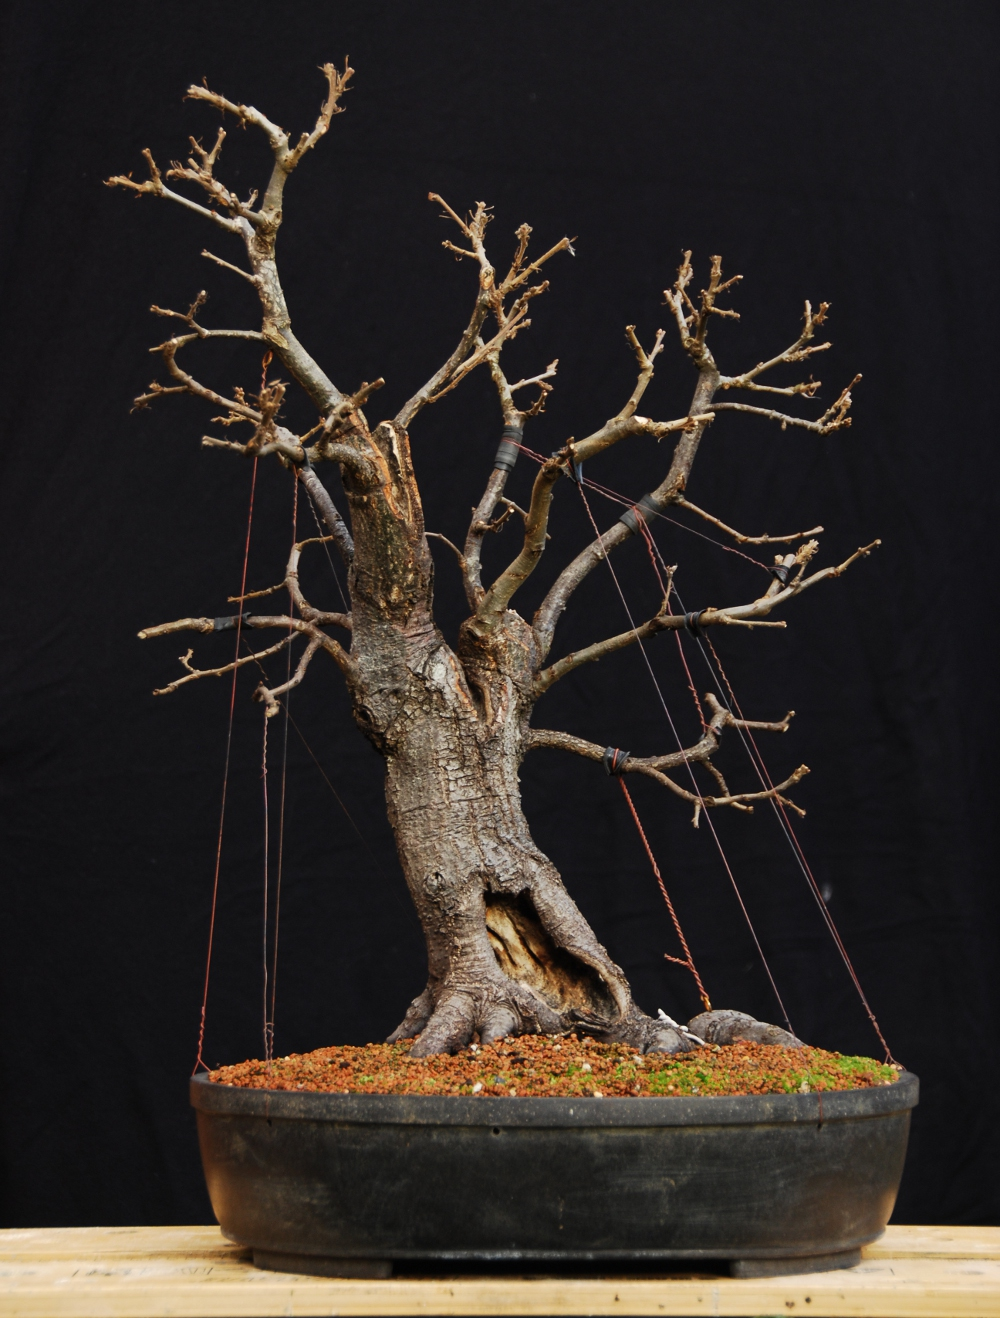 silva naturalis naturalistic oak bonsai with guy wires rh silvanaturalis blogspot com Bonsai Wire Sizes Bonsai Copper Wire